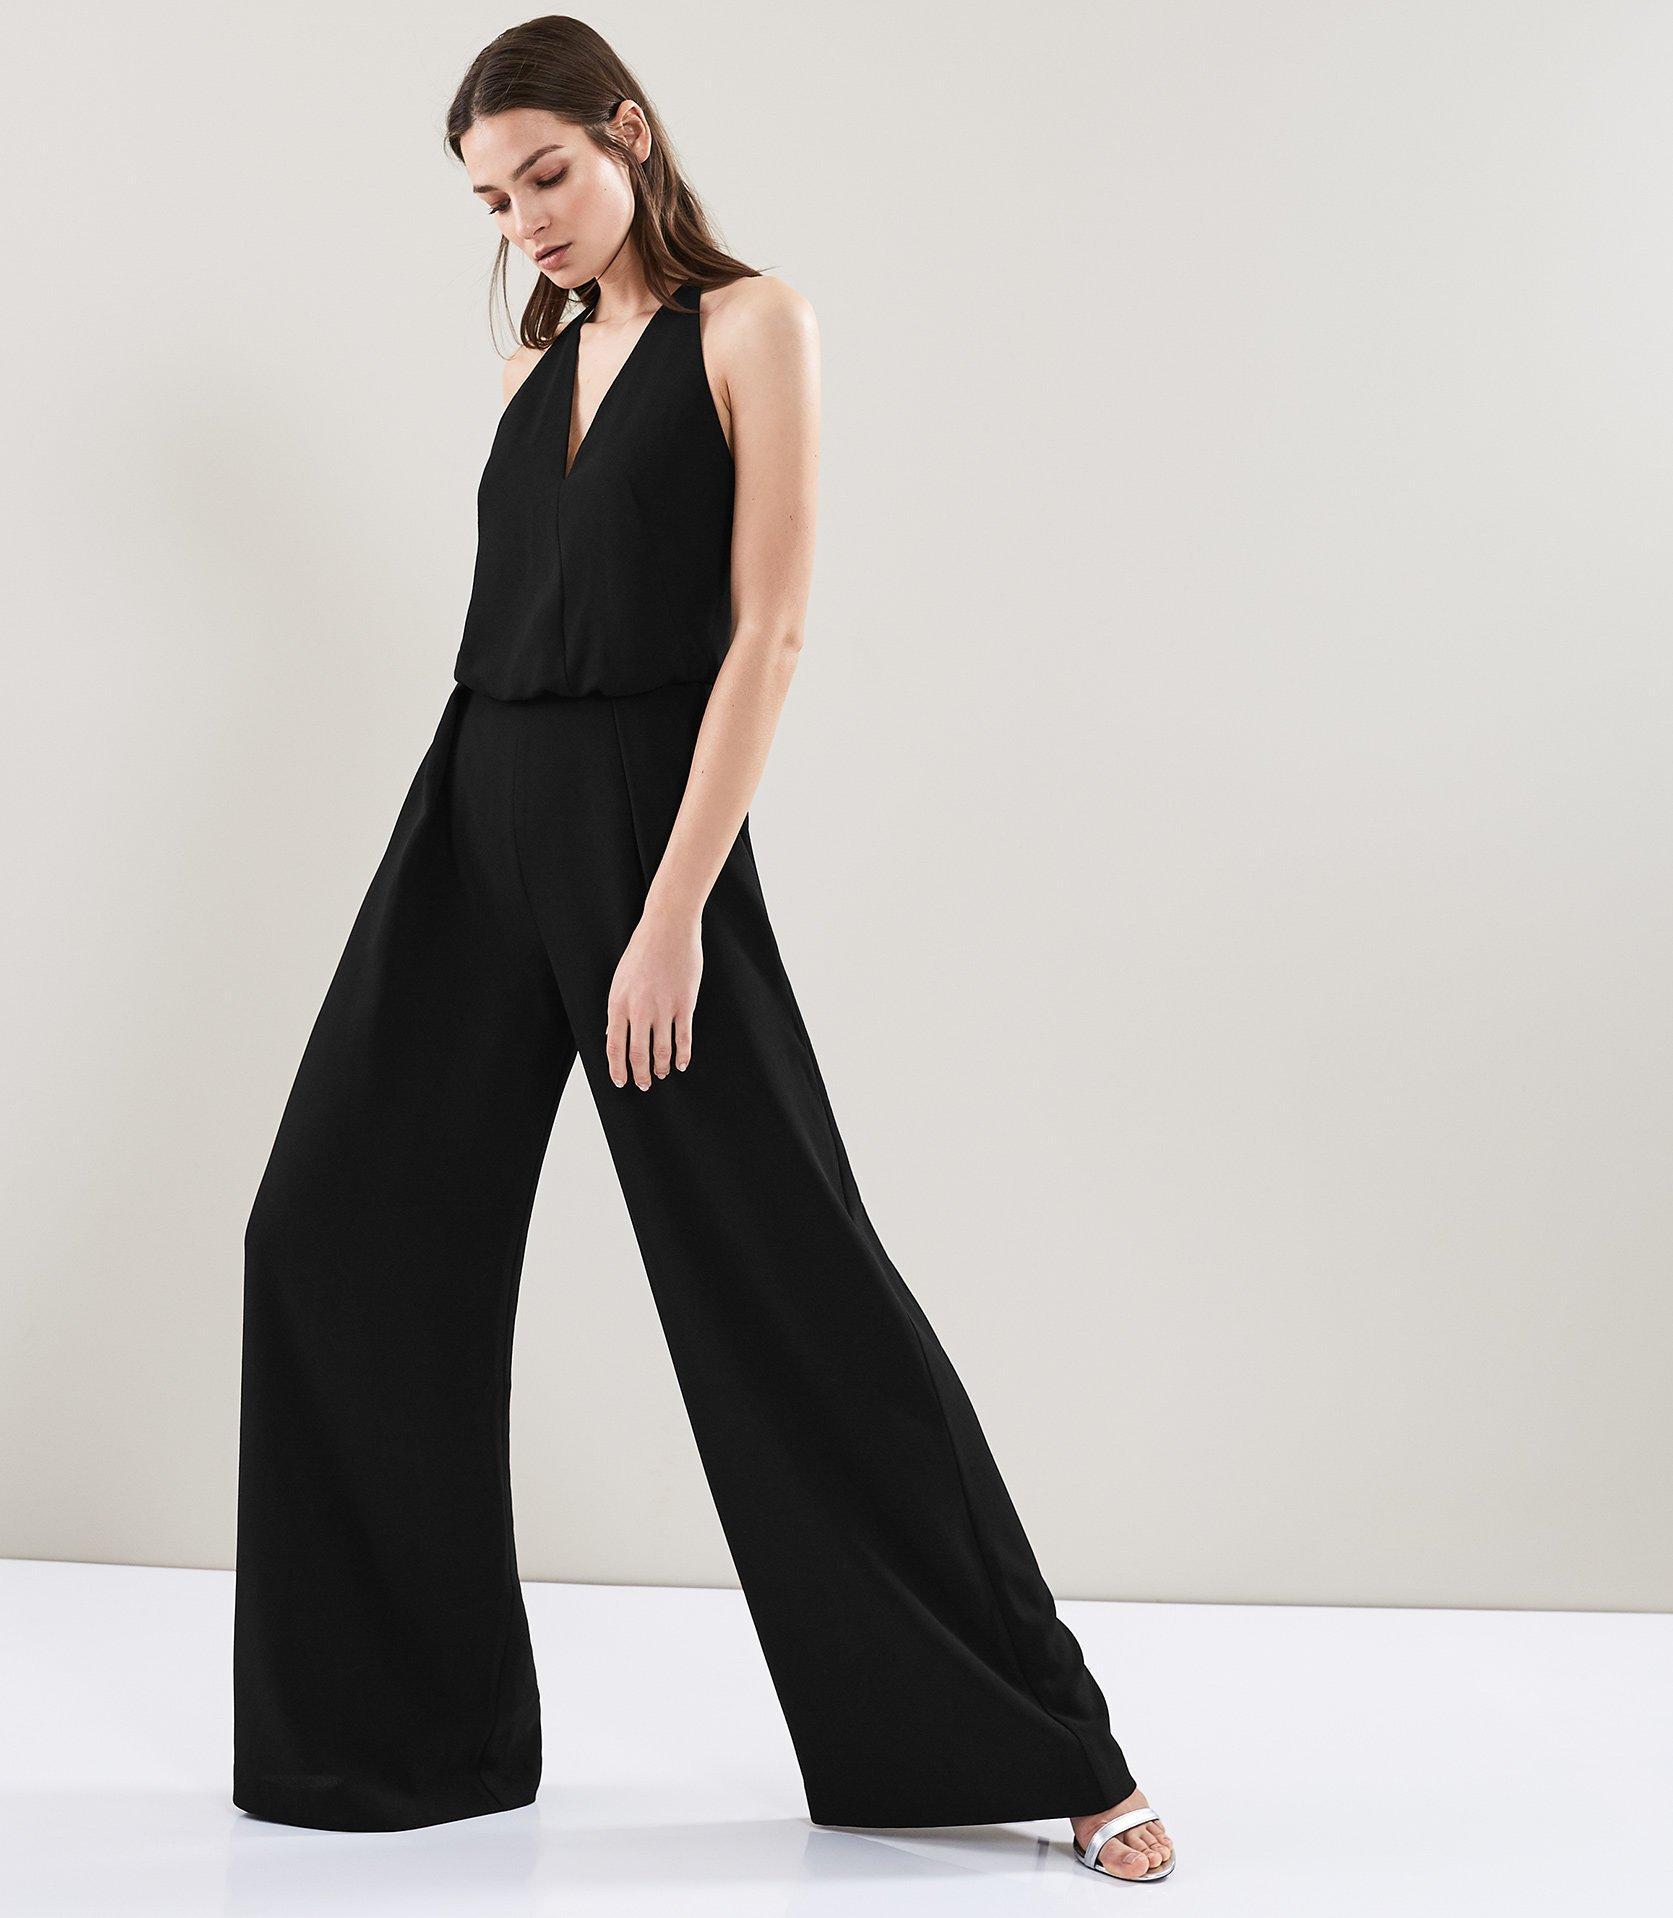 dc7401888d5 Reiss Yeva - Backless Strap Detail Jumpsuit in Black - Lyst